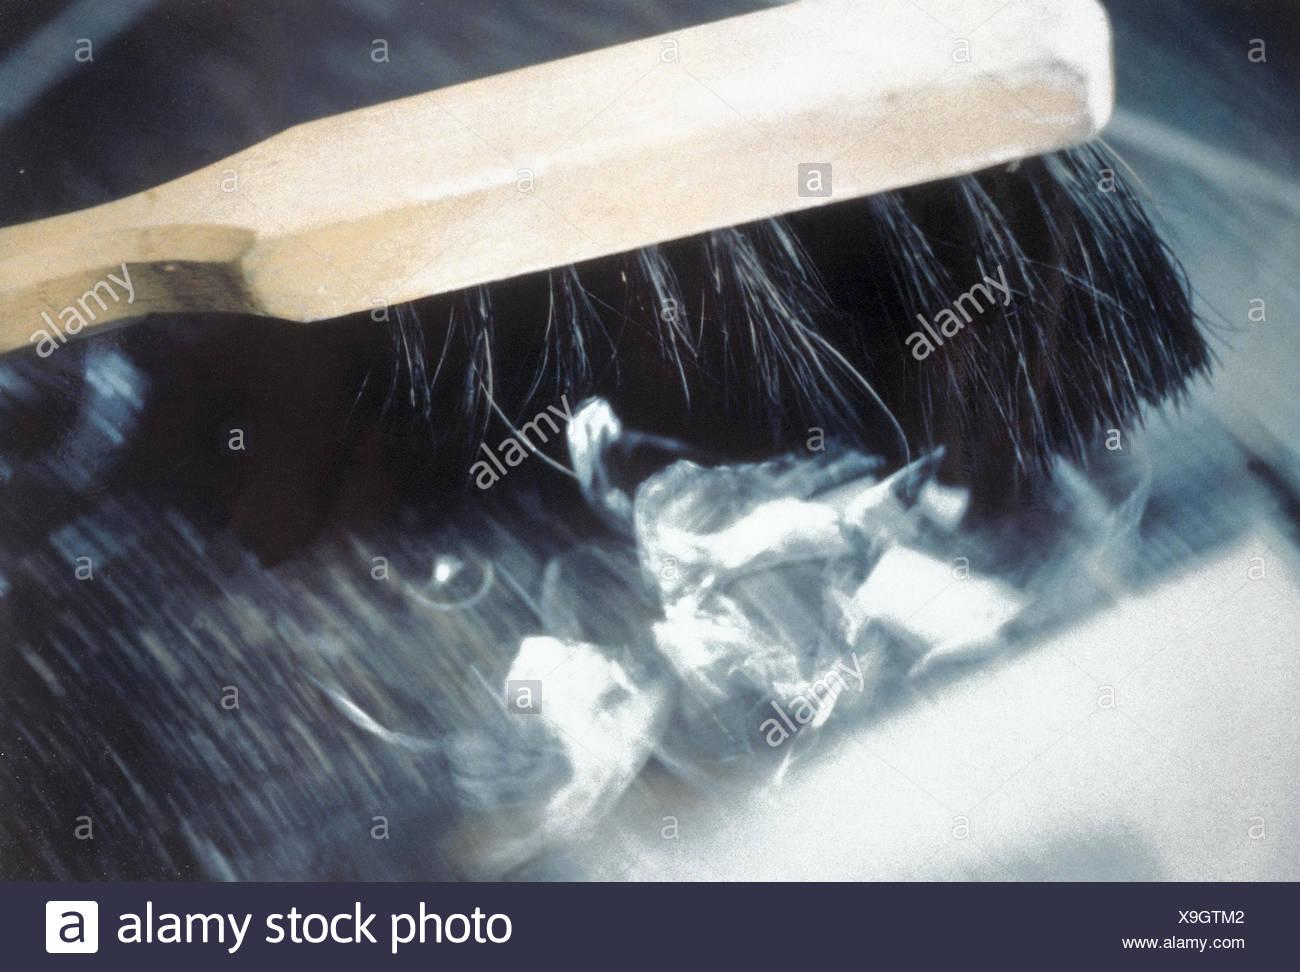 Glass shards, handbrushes, sweep, Kehrbesen, brooms, shards, glass fragments, misfortune, bad luck, zusammenkehren, clear up, clean, clean, clean, cleaning, cleanness, order, inside - Stock Image